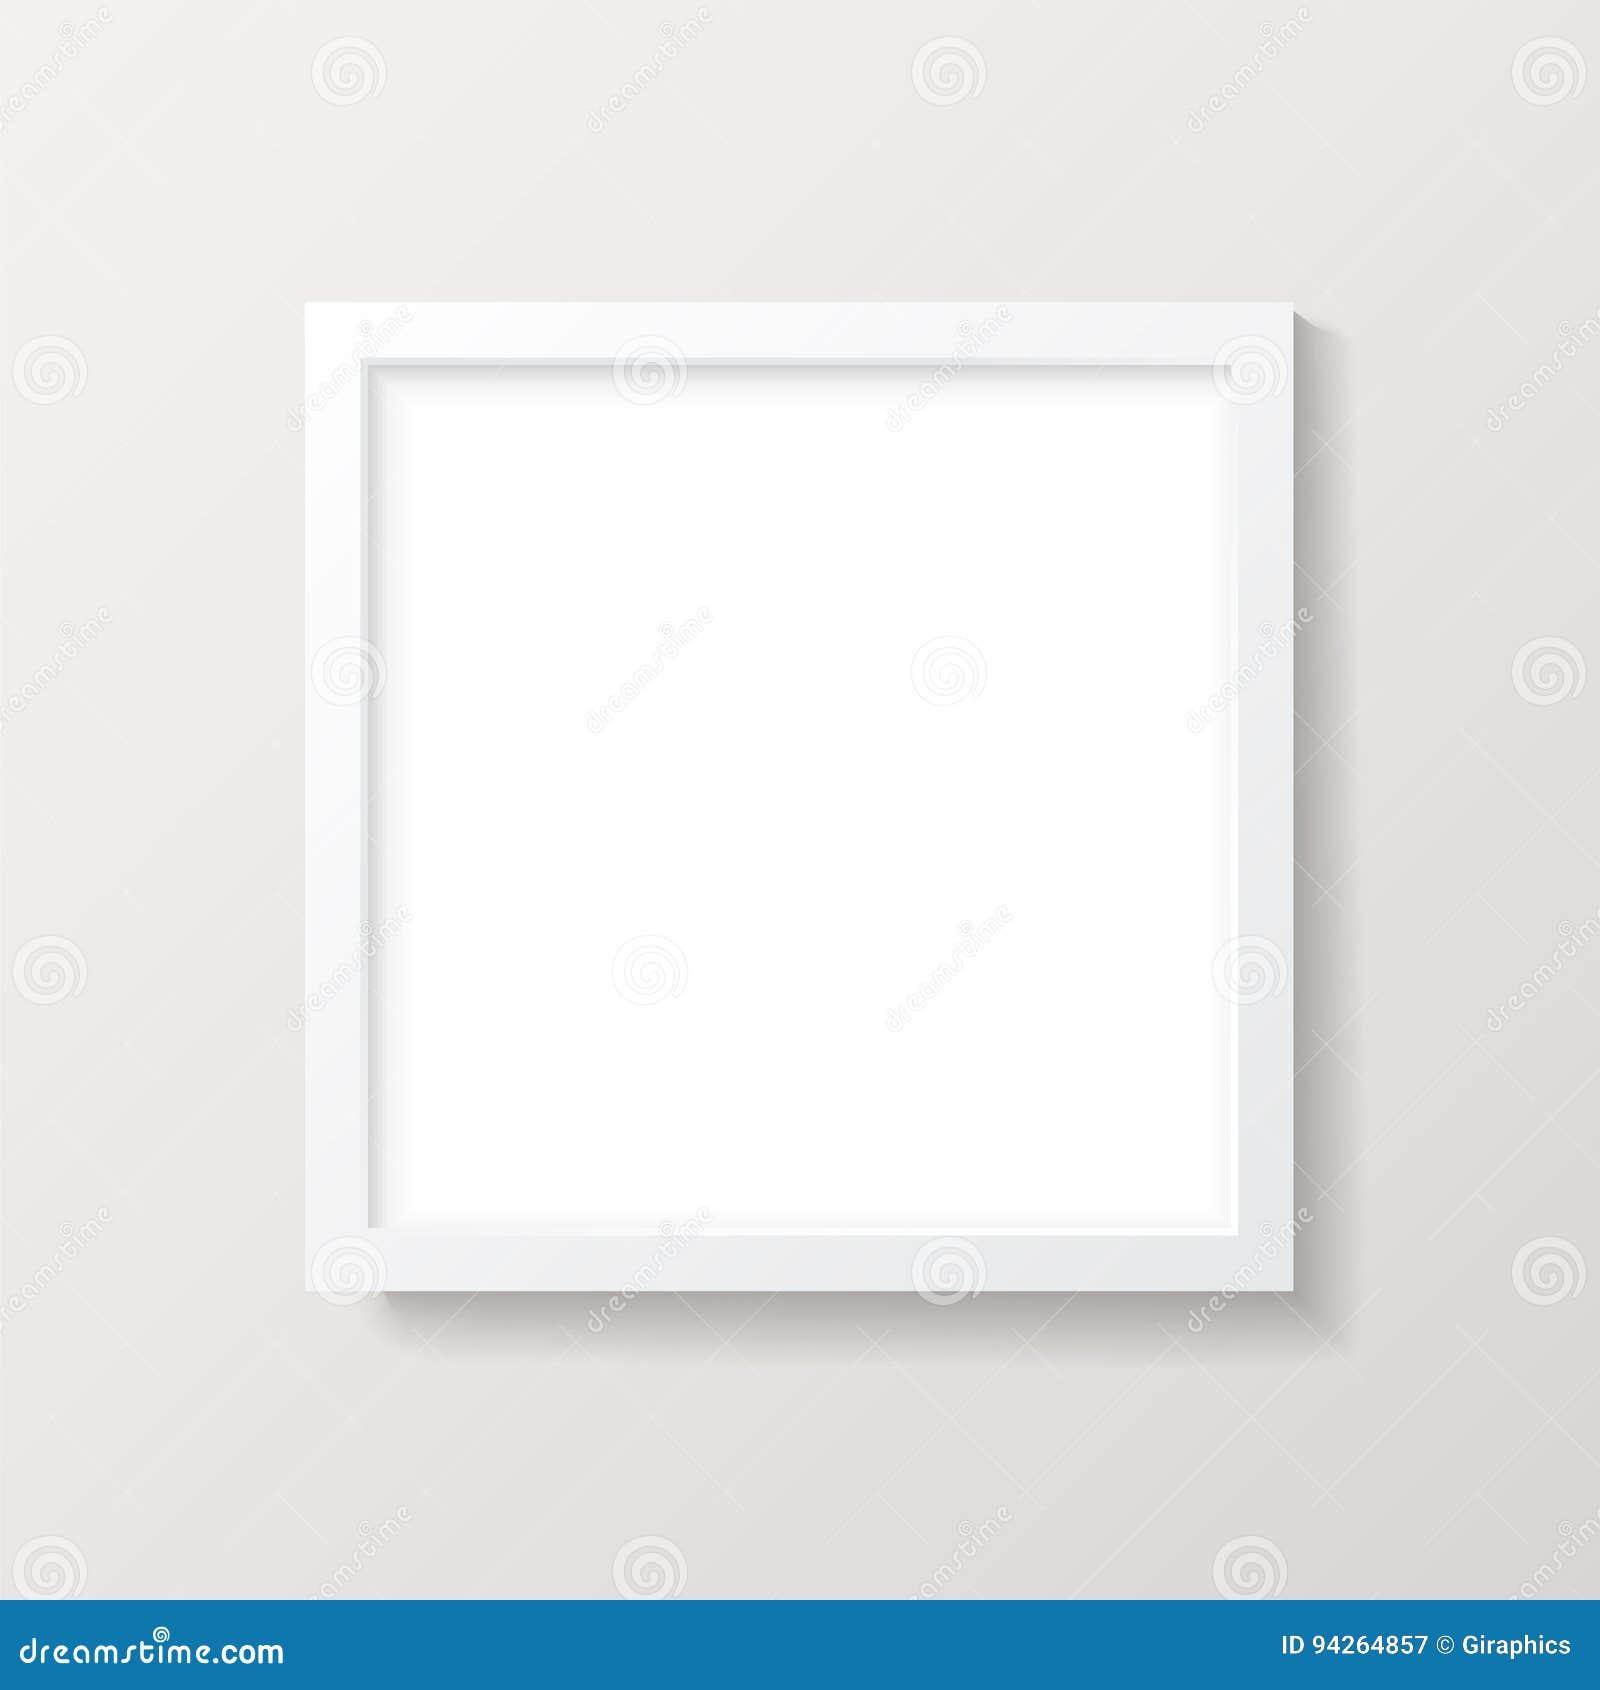 Realistisches Leeres Weißes Quadrat-Bilderrahmen-Modell Vektor ...